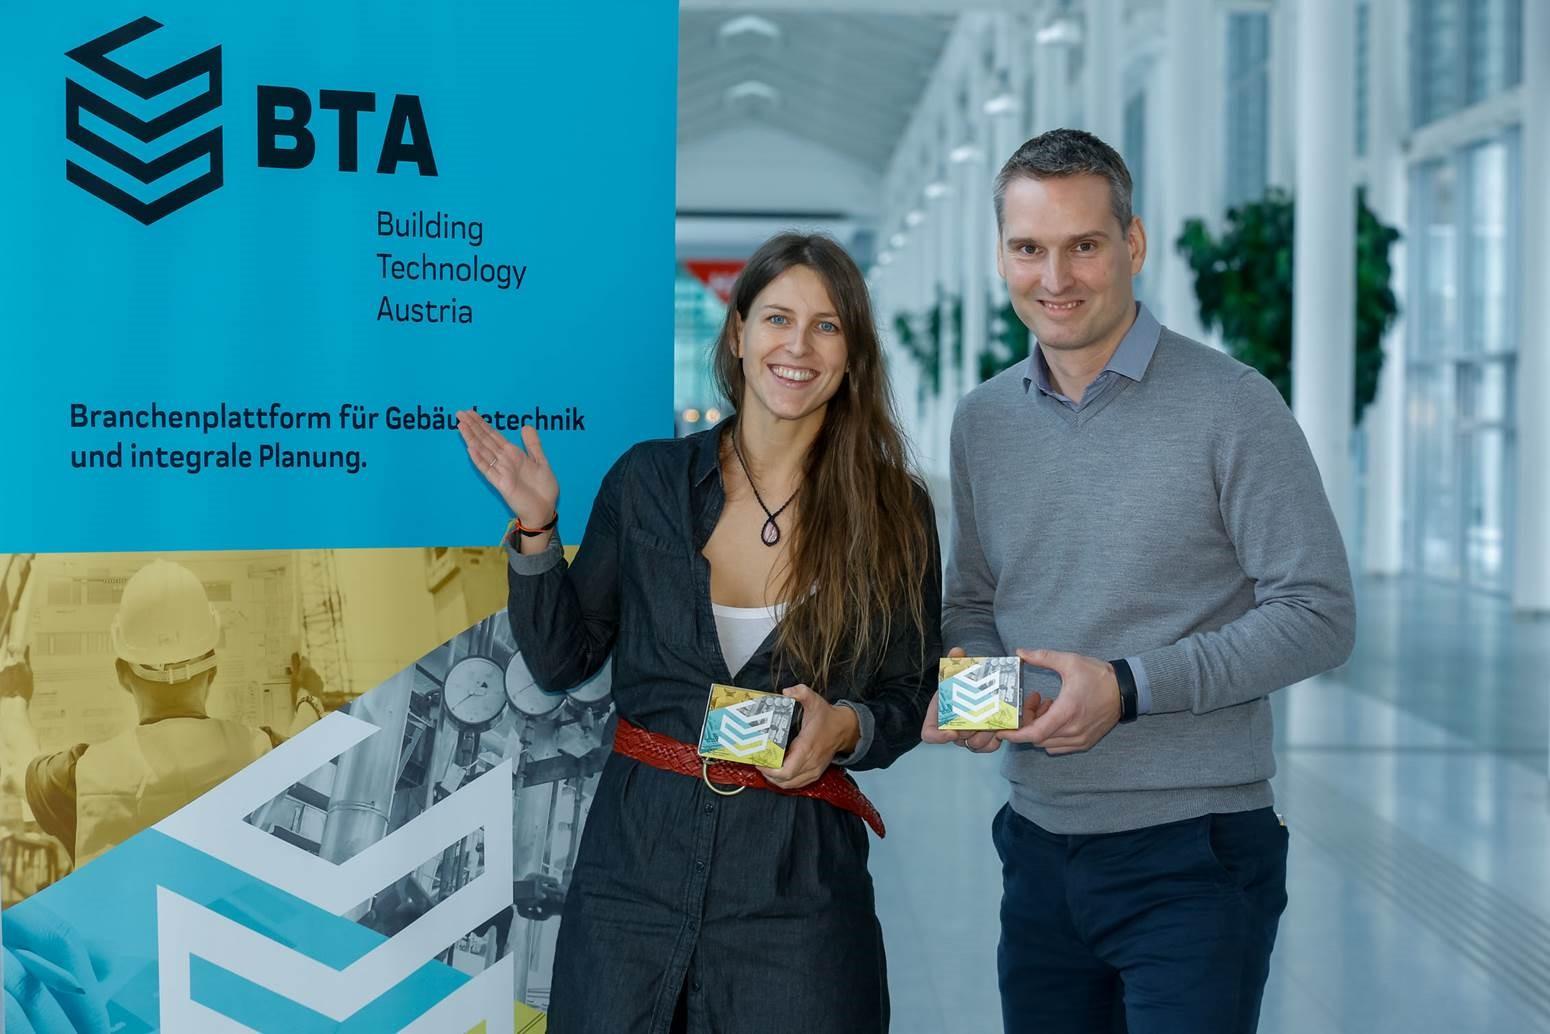 BTA - Building Technology Austria